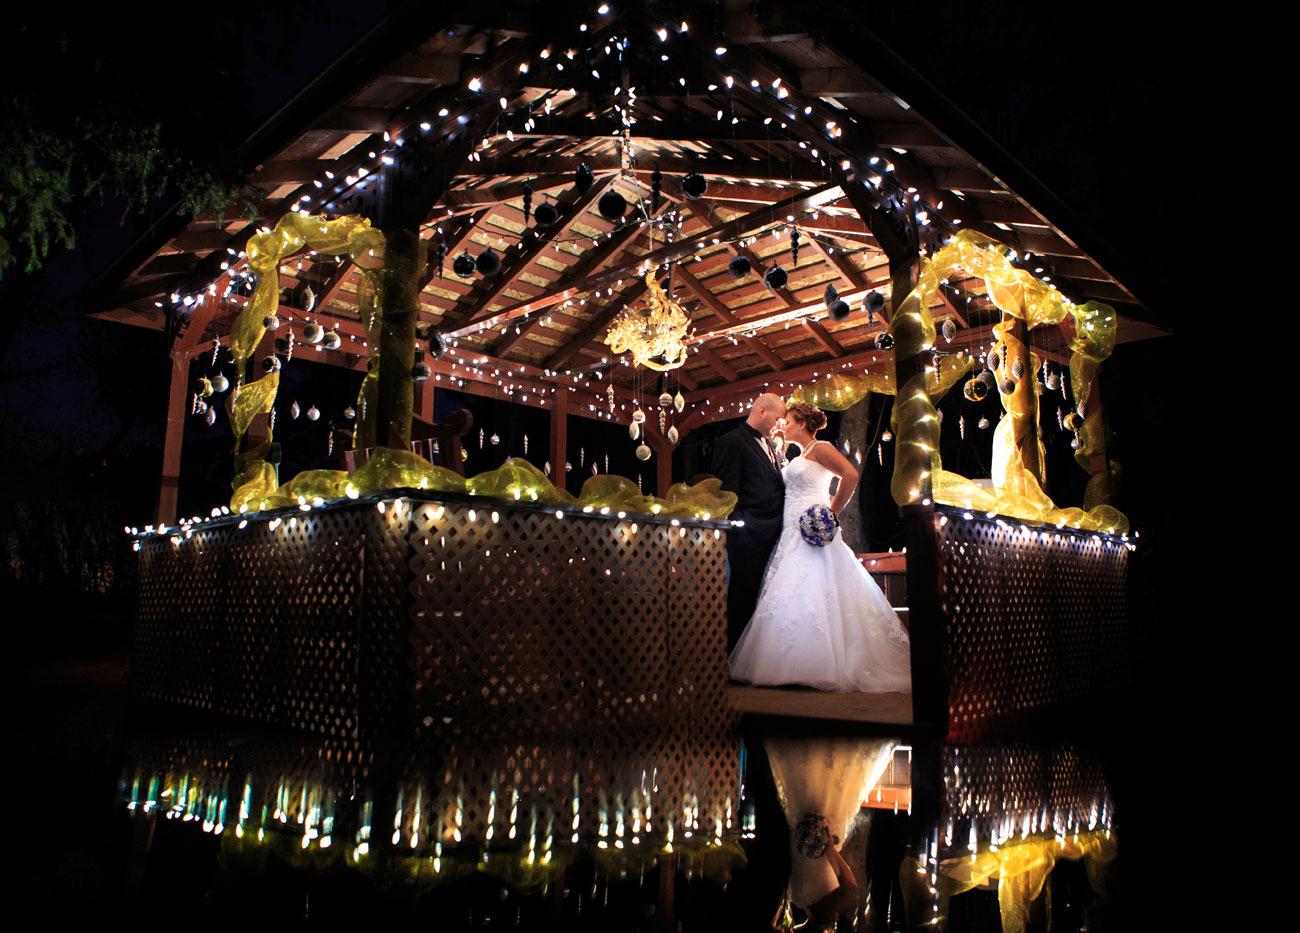 Courtney & Ryan - Christmas Wedding - Three Hills, Alberta - Wedding Photography (36)